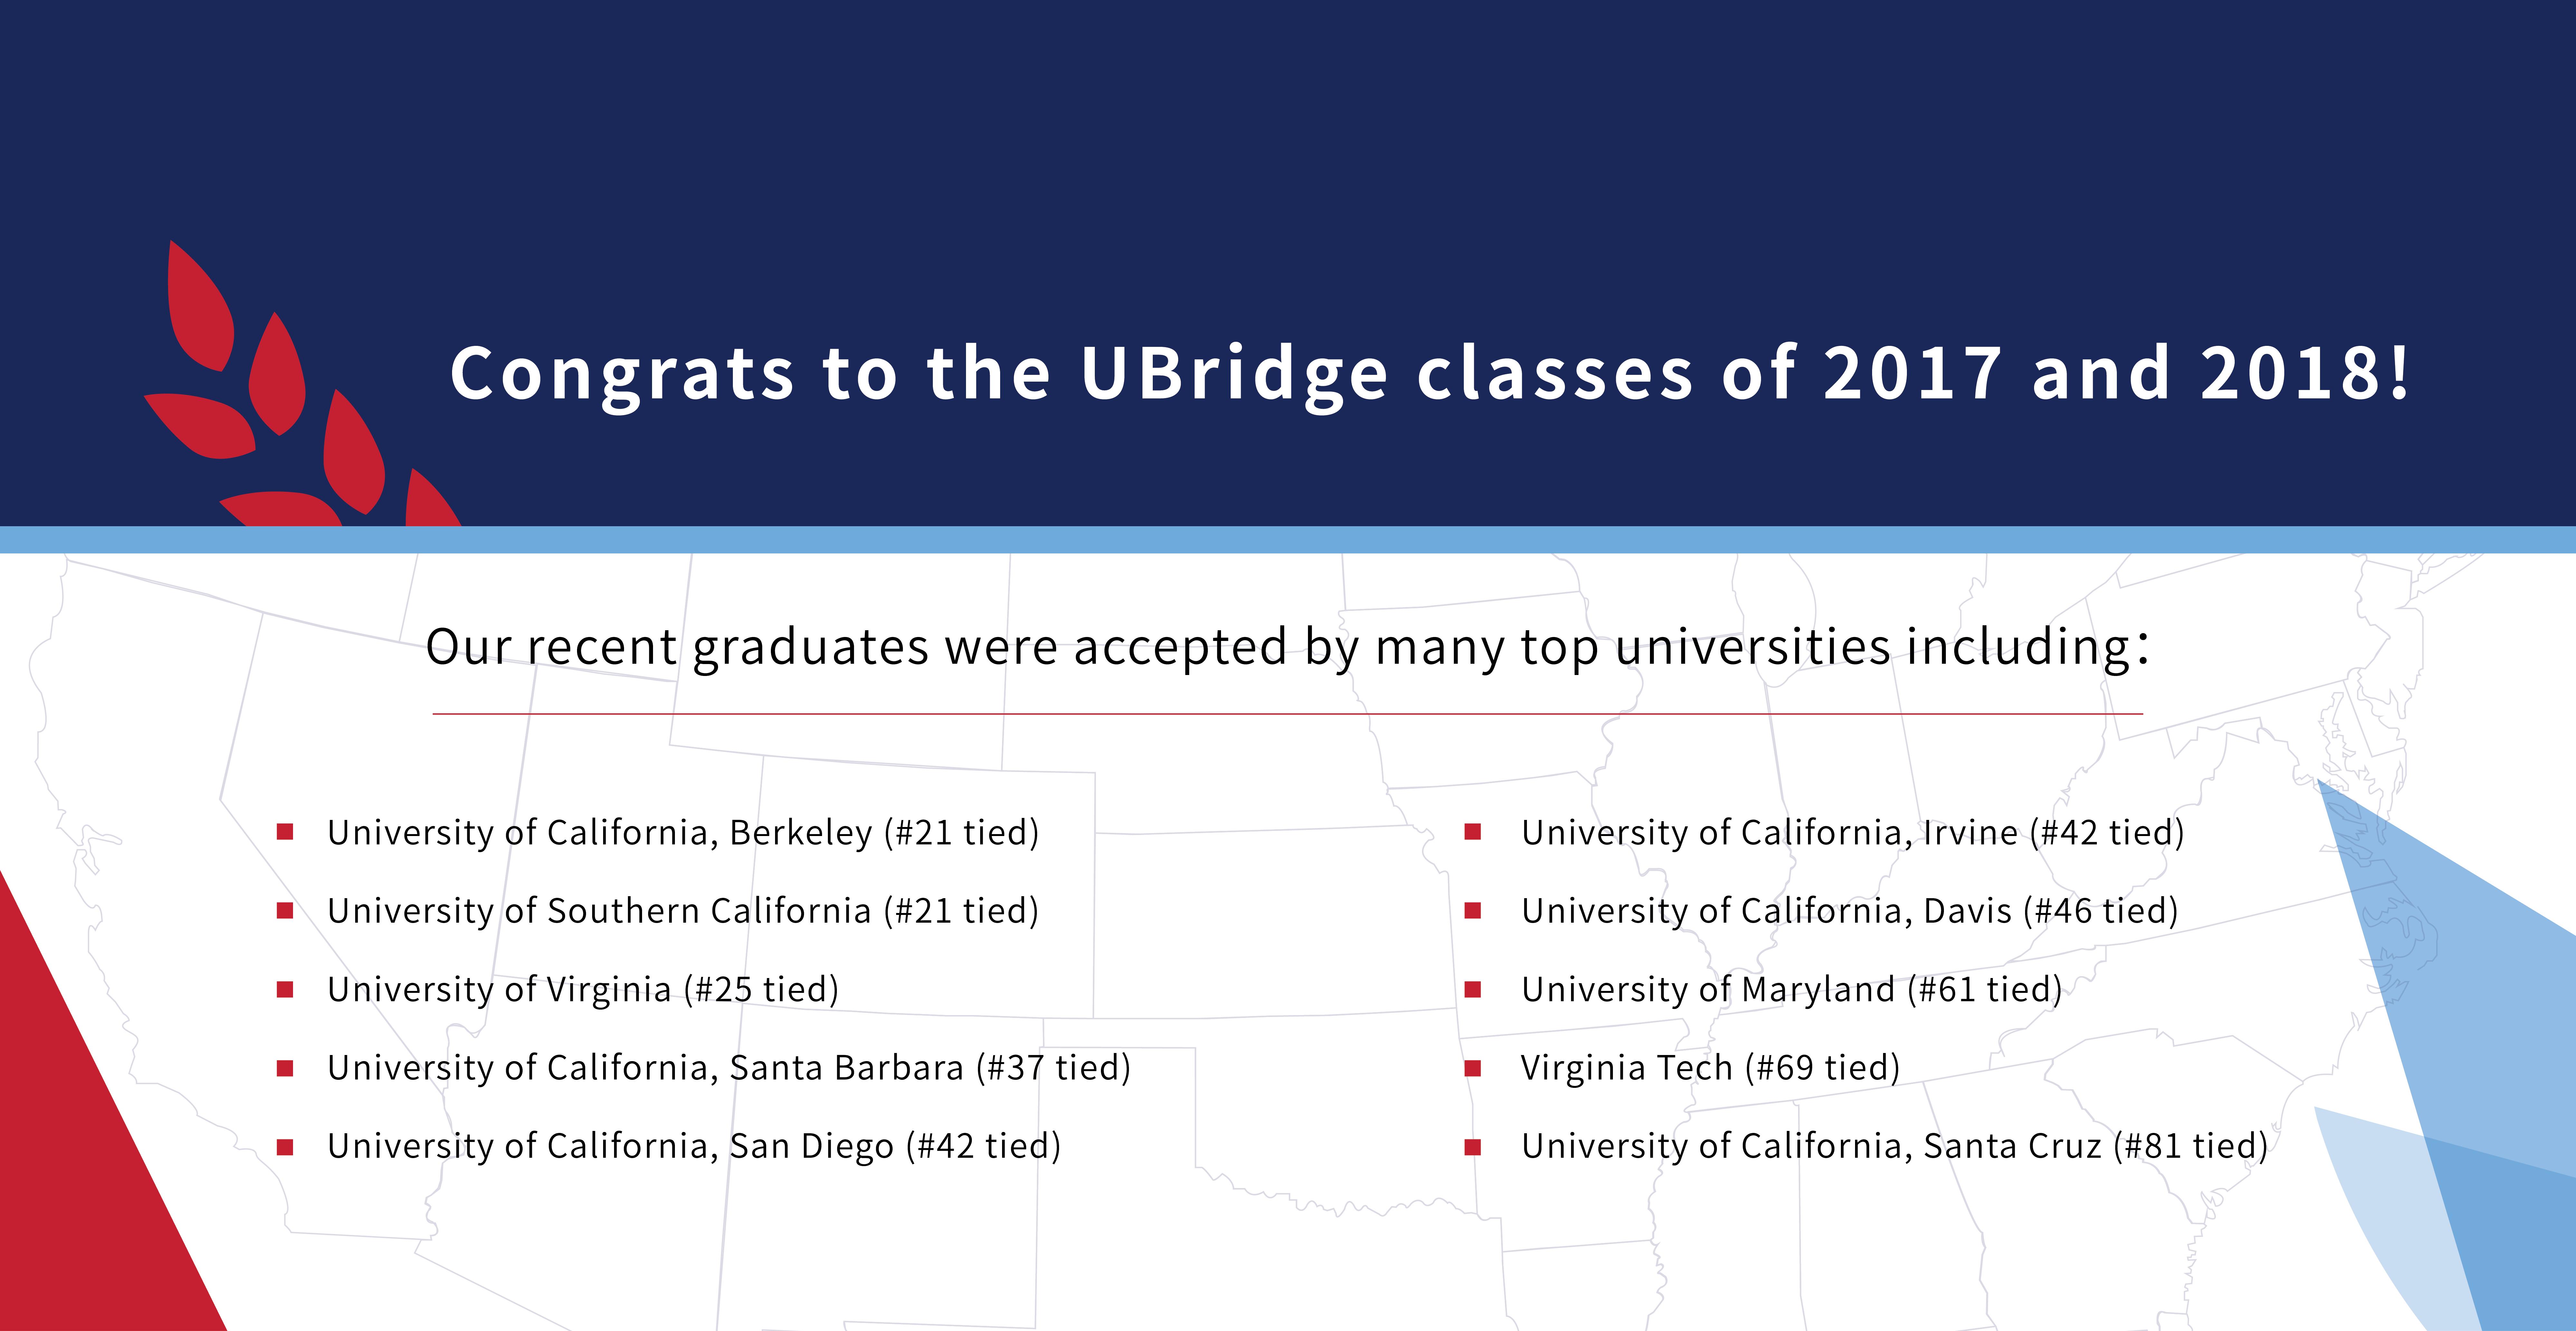 Ubridge classes